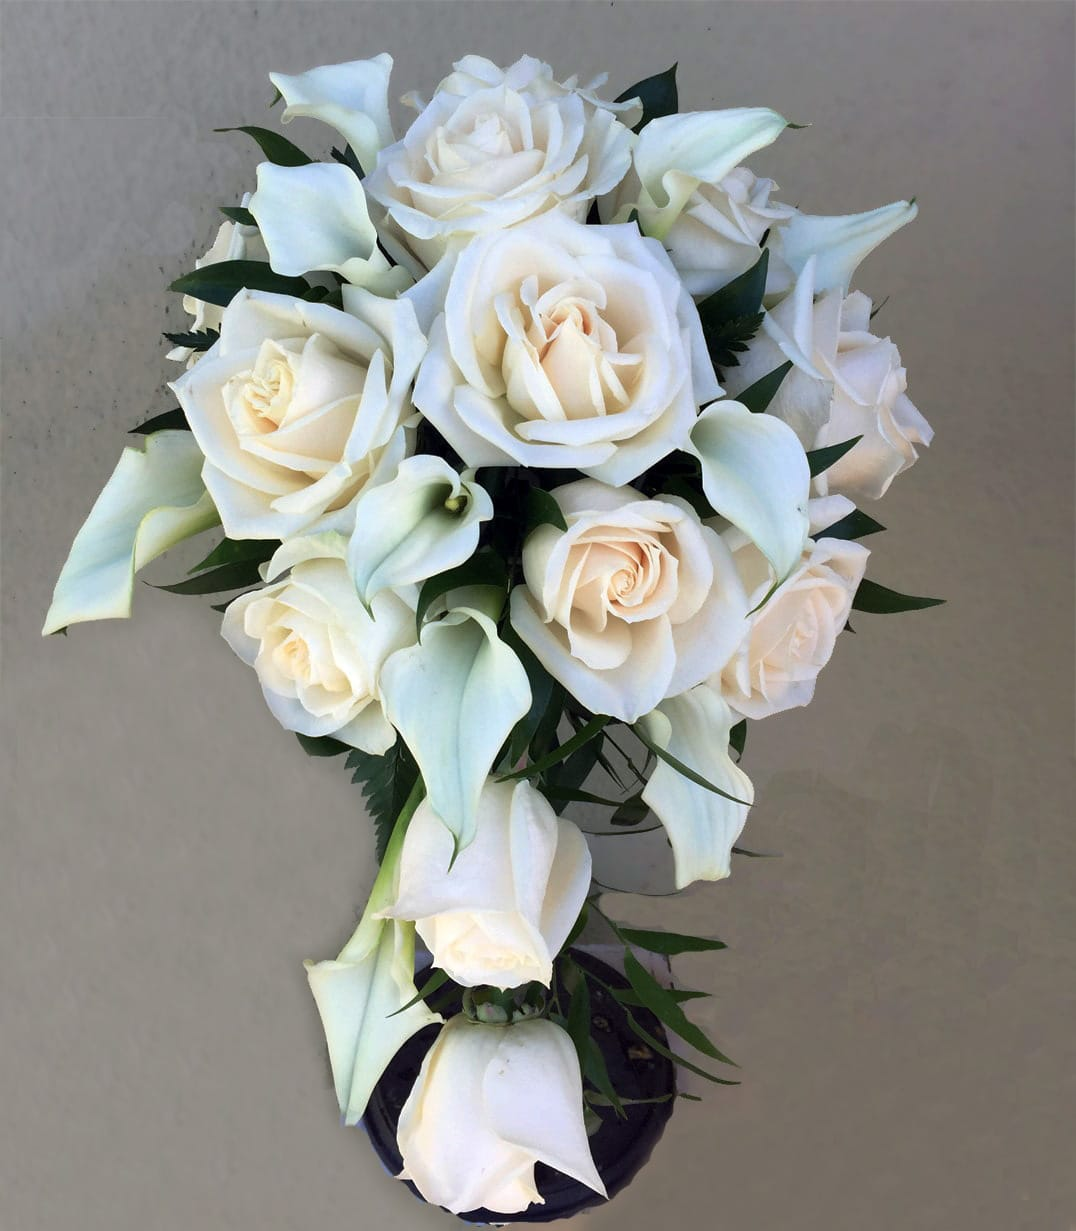 Rose Calla Lily Bouquet In San Jose Ca Valley Florist